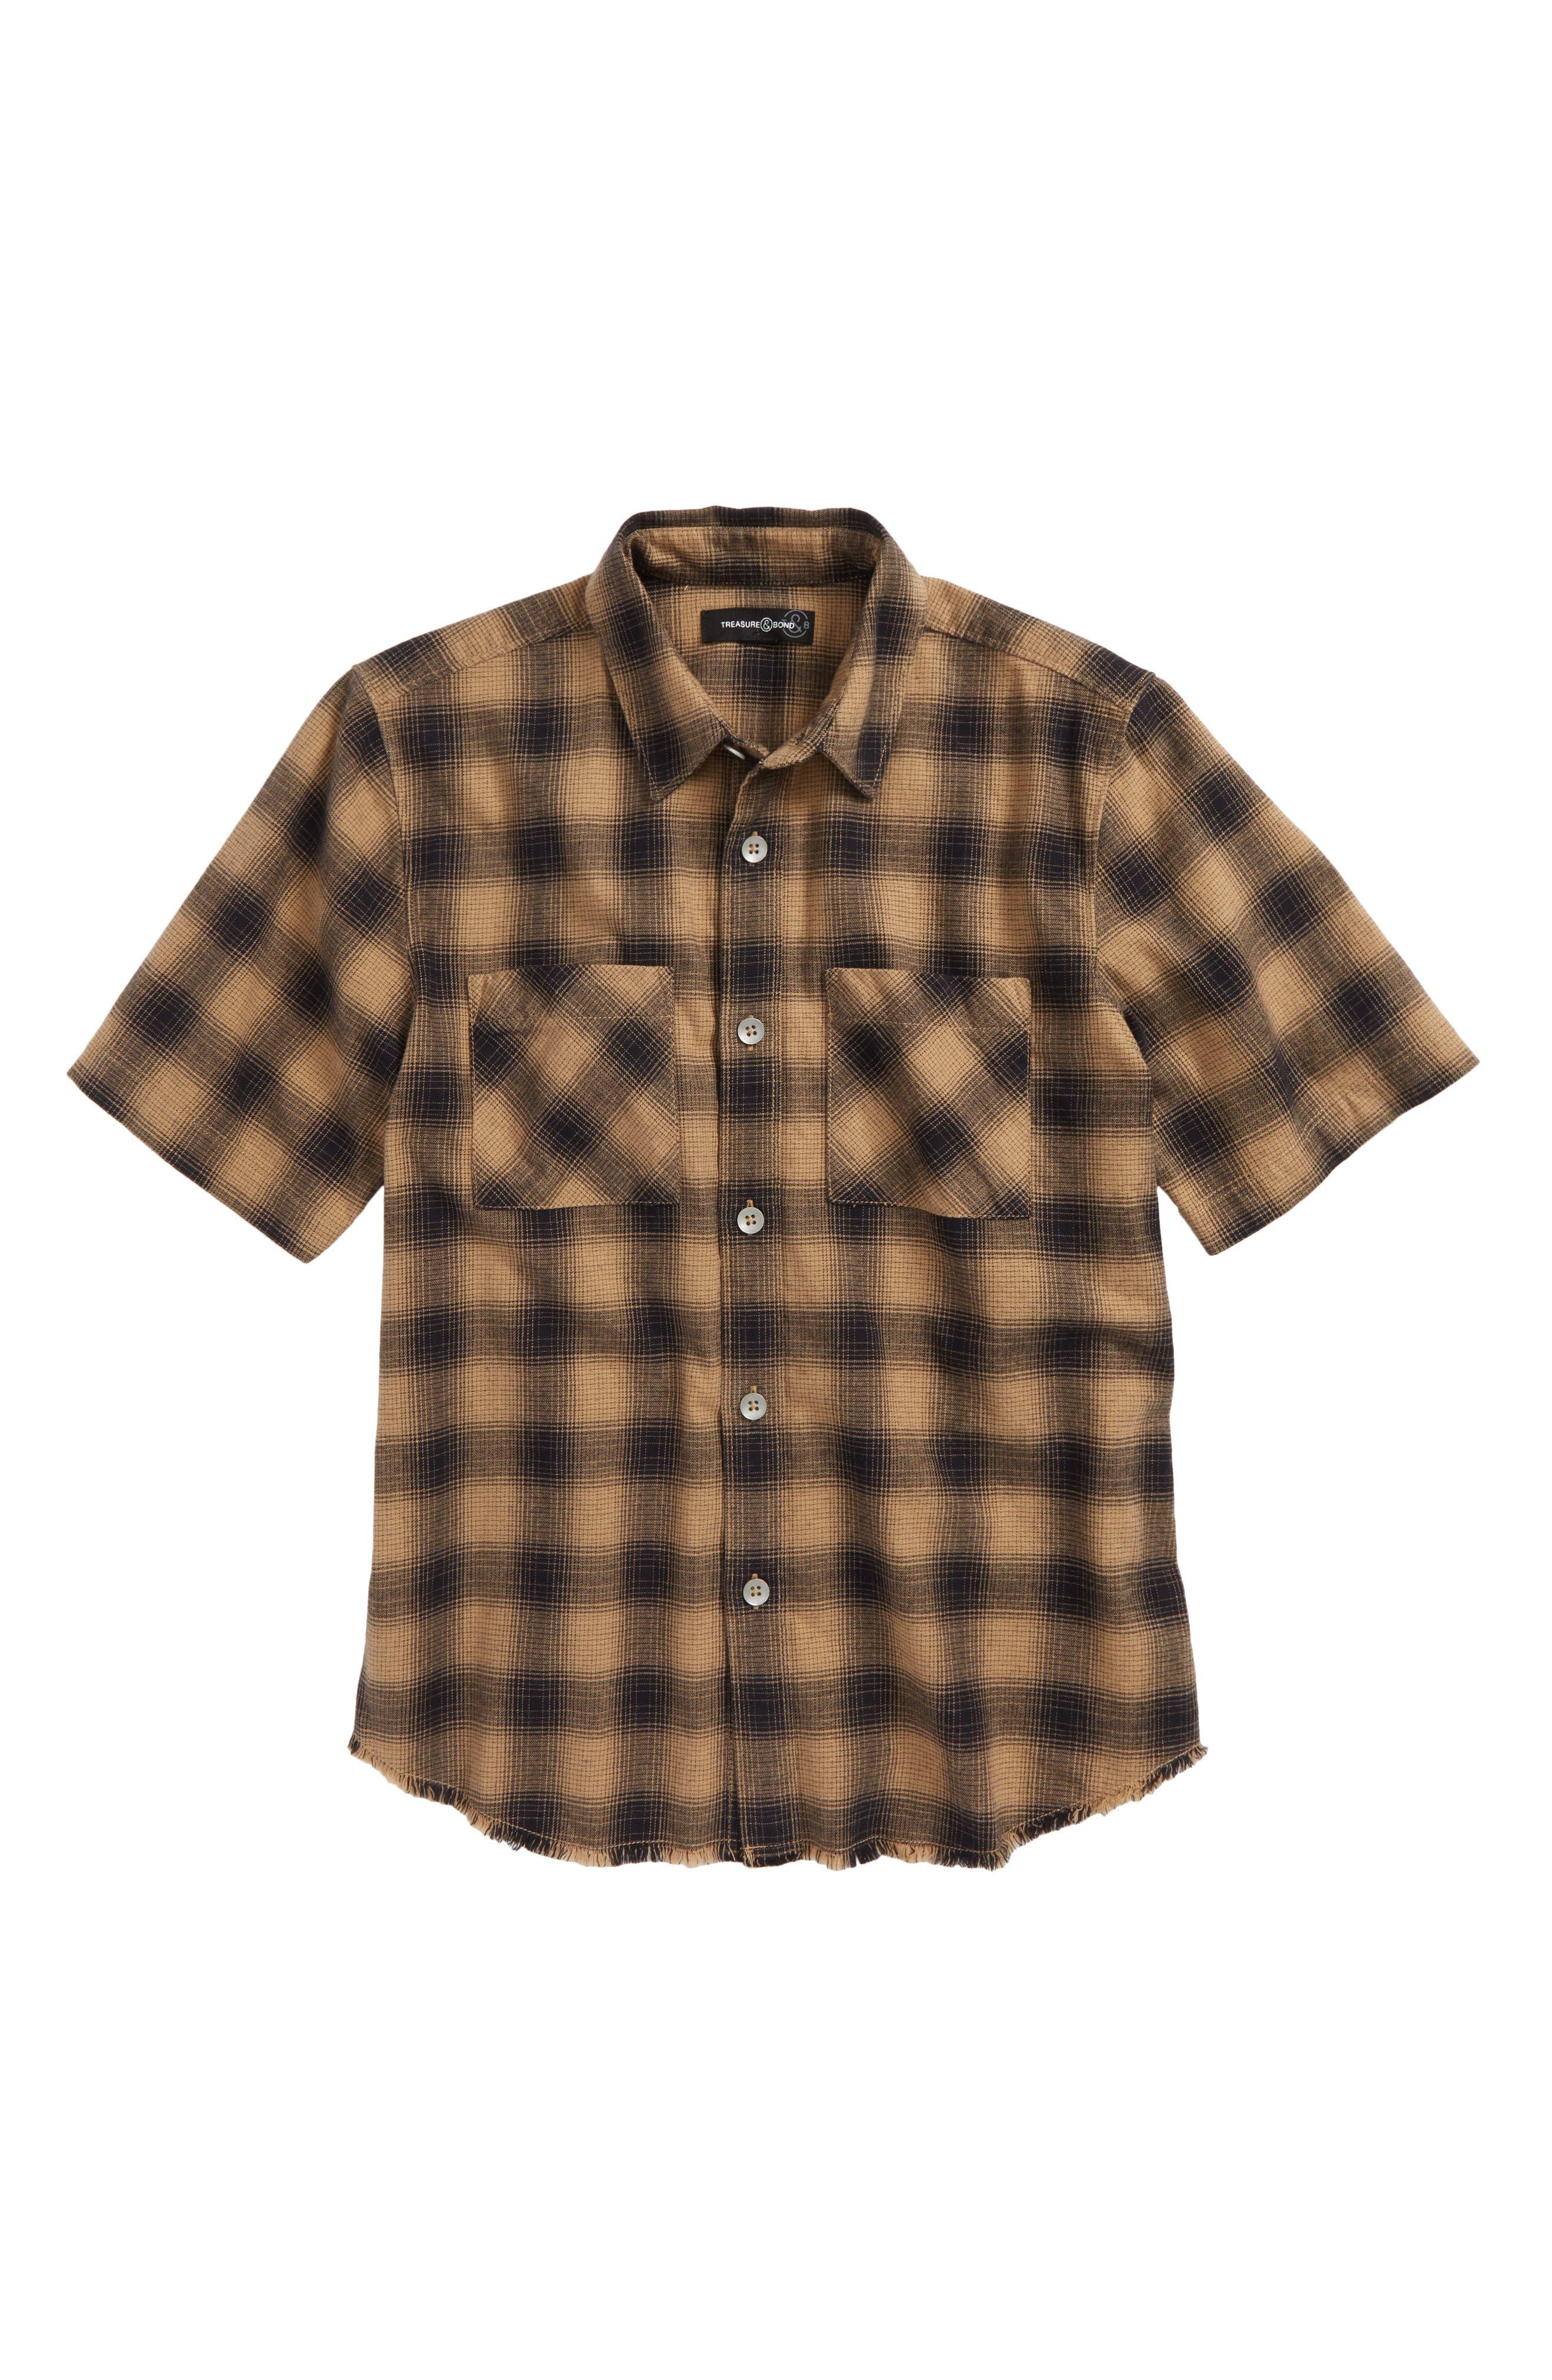 Distressed Plaid Flannel Shirt,                         Main,                         color, 210